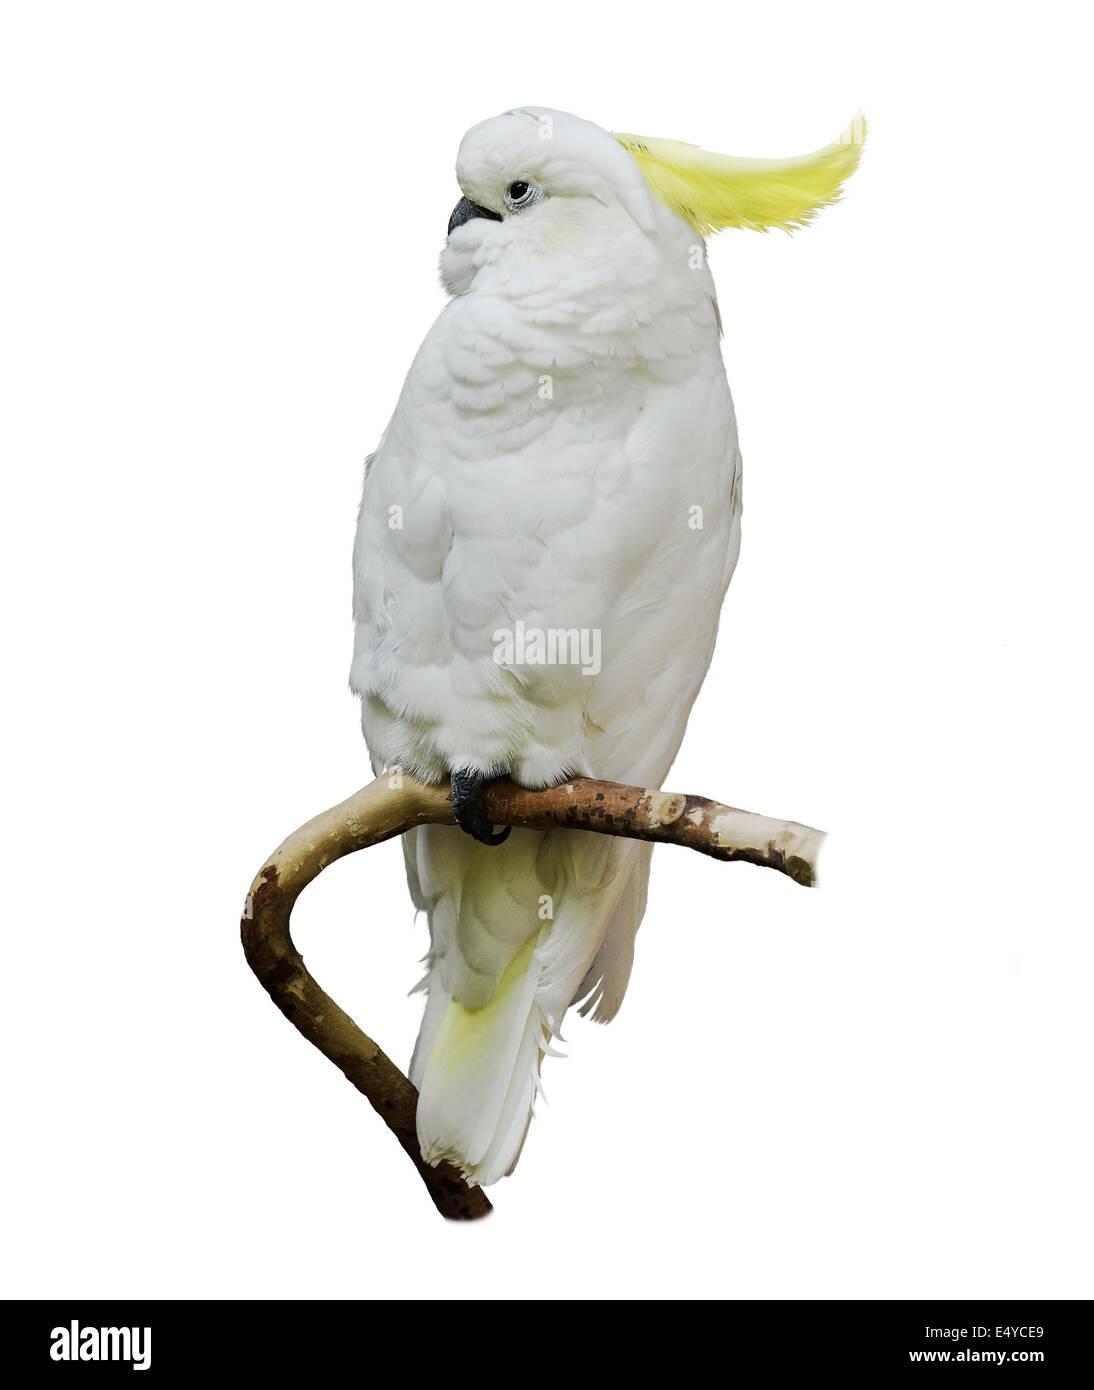 Yellow-Crested Cockatoo - Stock Image